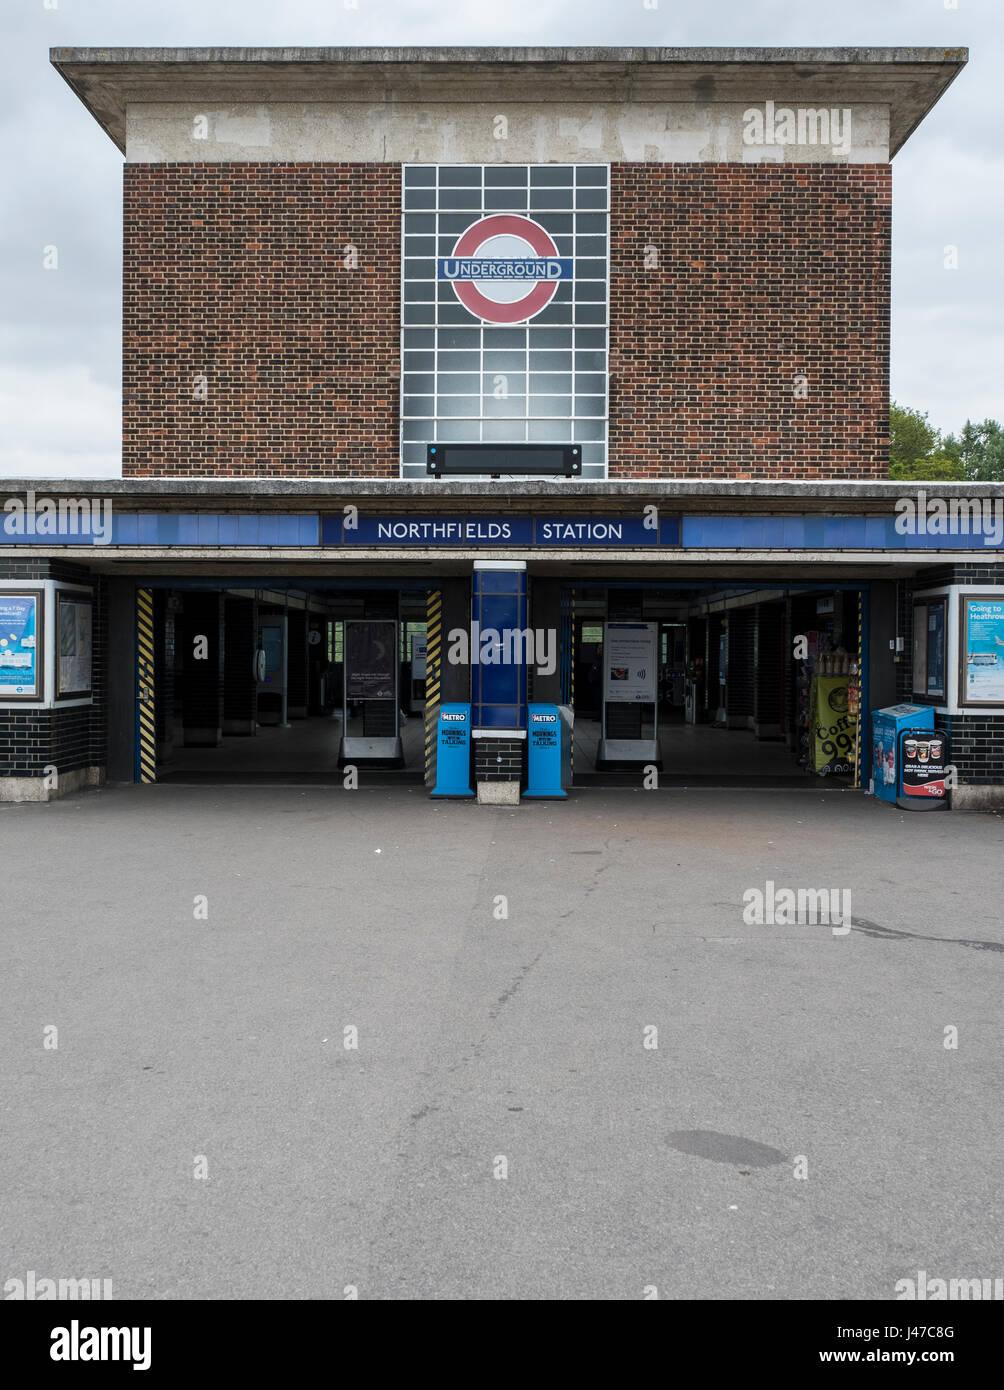 Northfields station - Stock Image